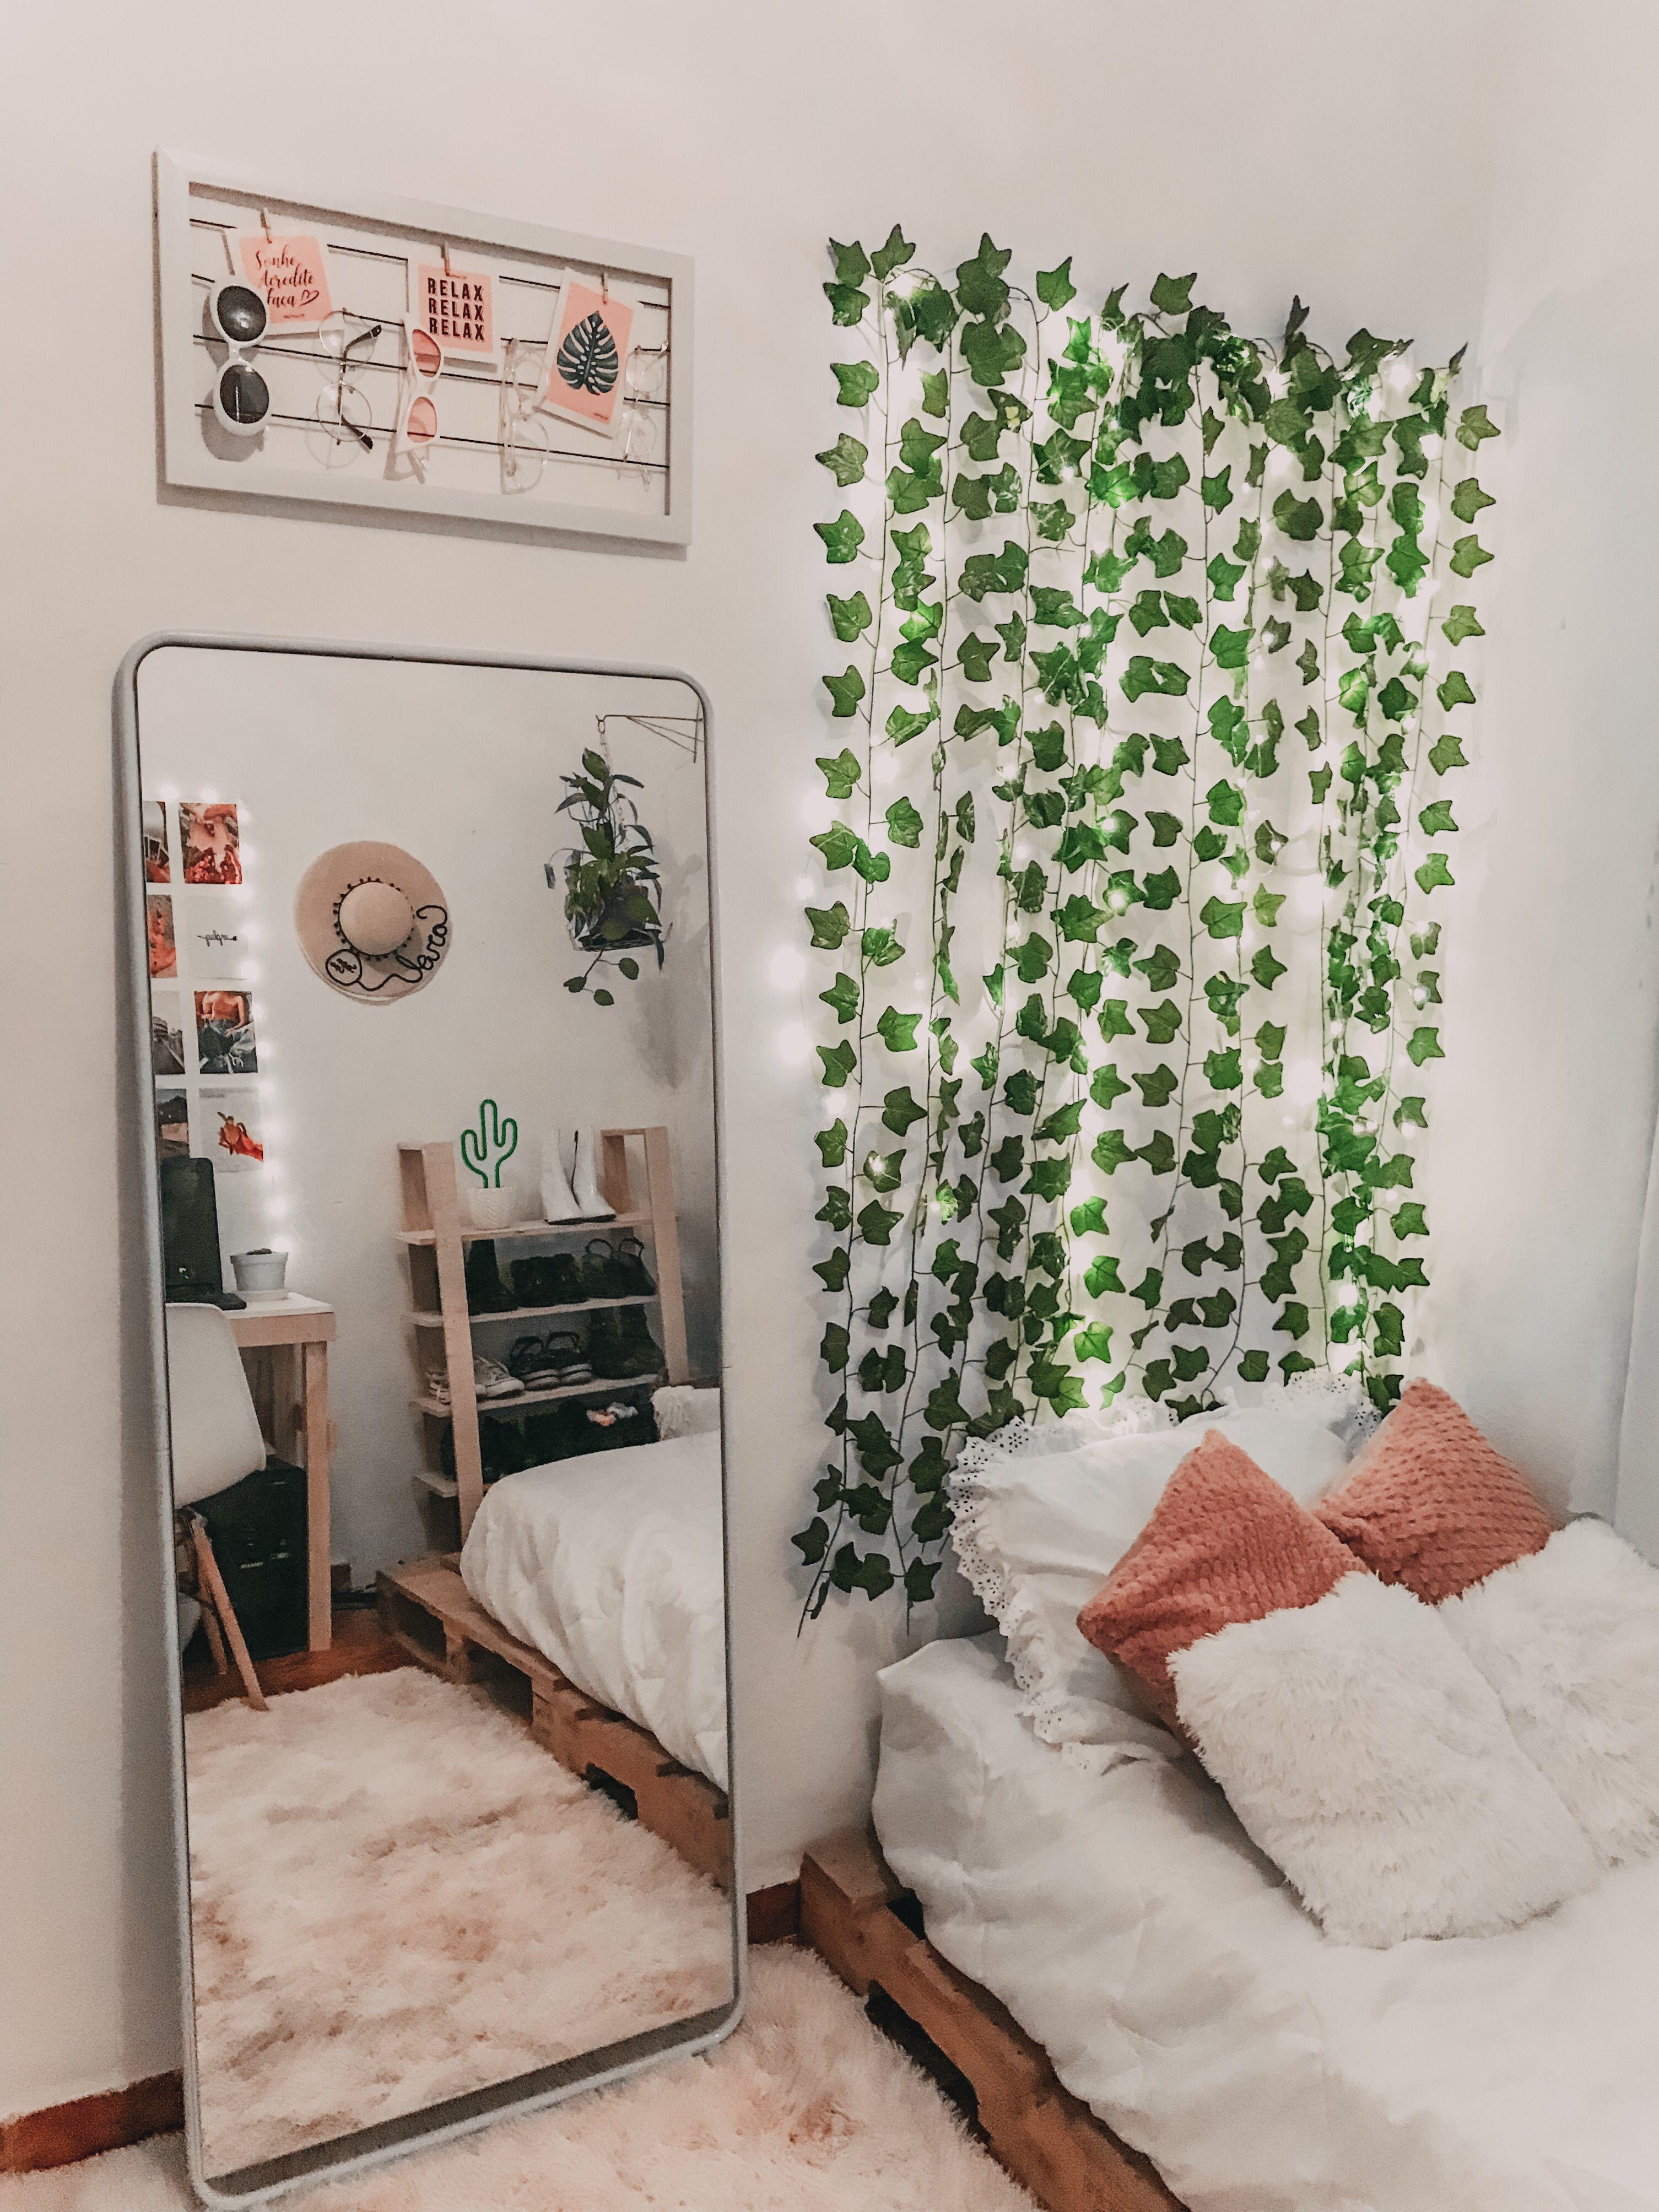 Aesthetic Room Tumblr : aesthetic, tumblr, Decoração, Quarto, @eucarolsoaress, Rooms,, Decor,, Decor